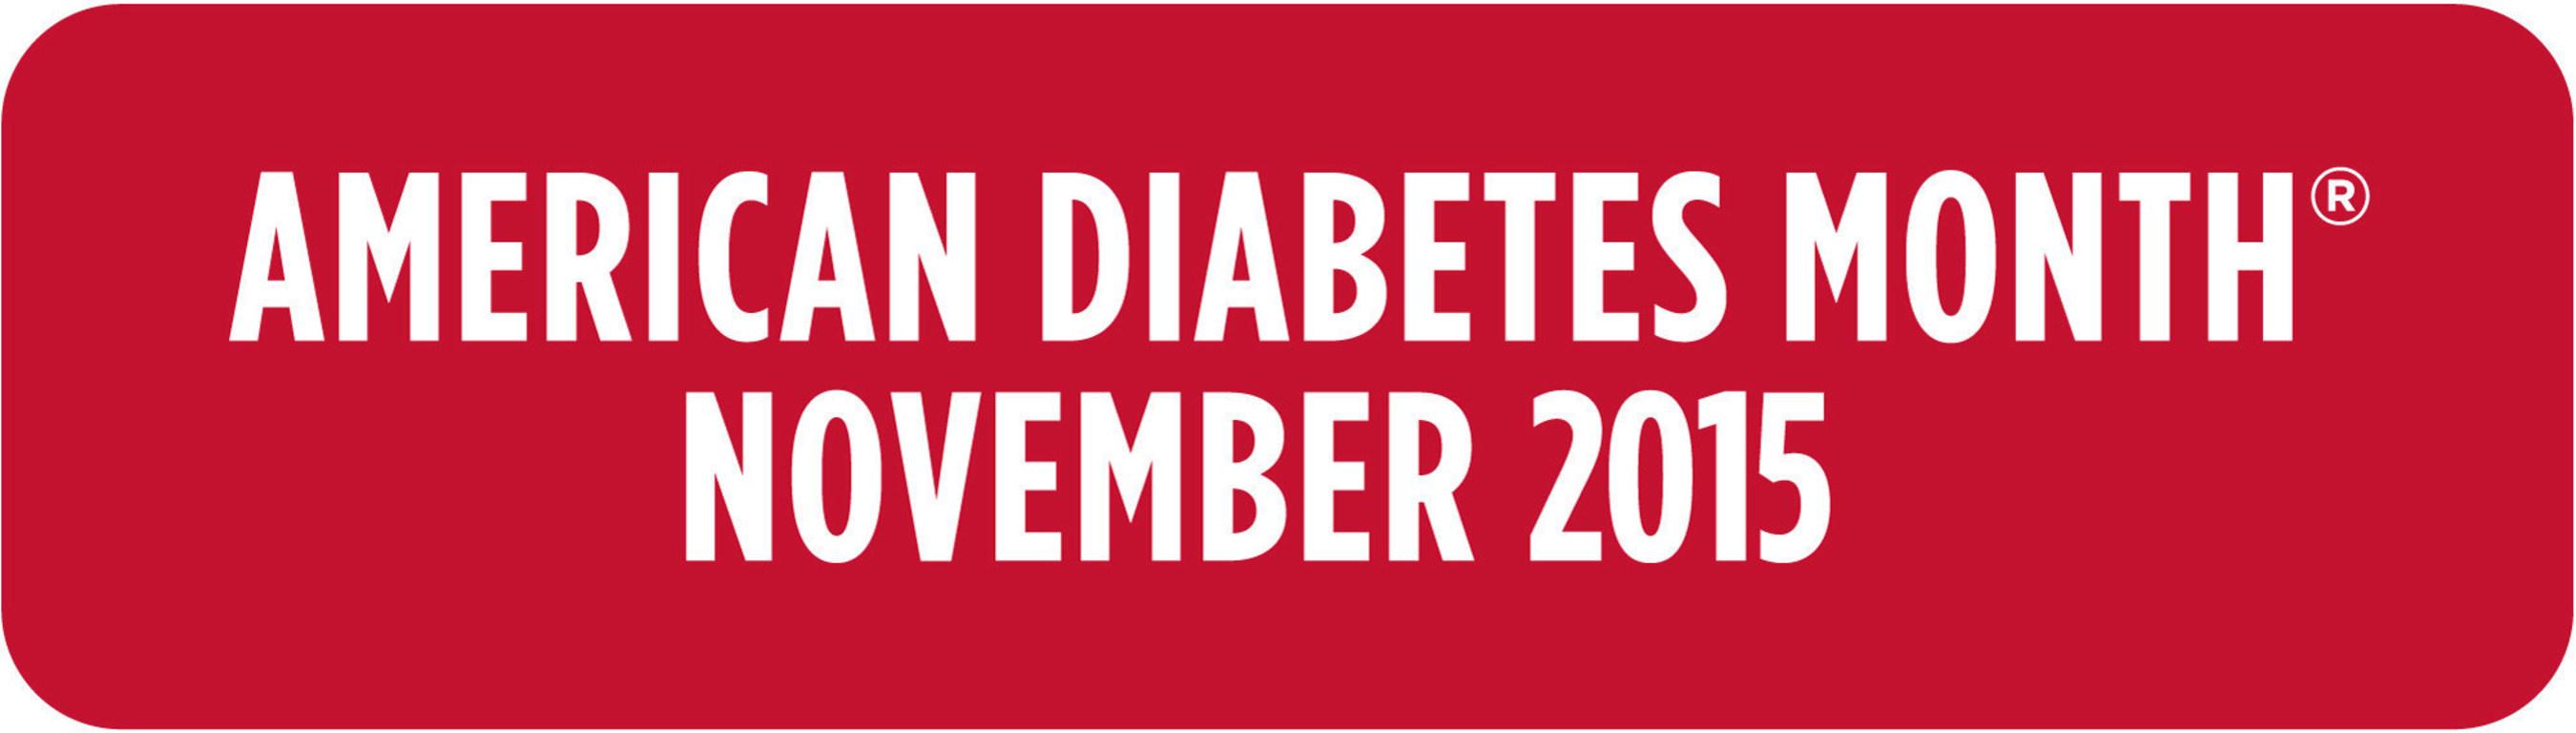 American Diabetes Month November 2015